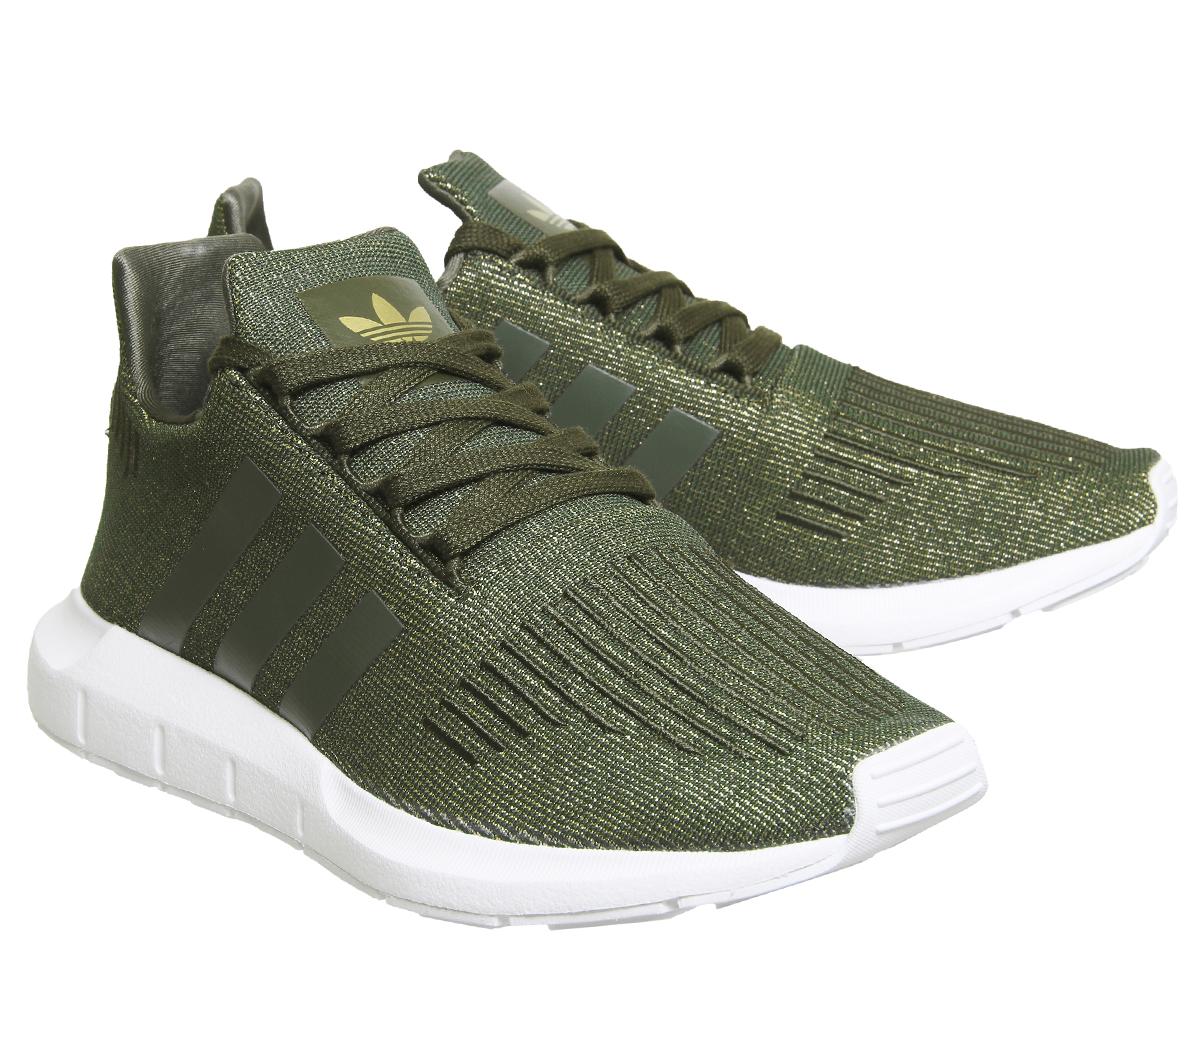 d1a1d6781c6131 Womens Adidas Swift Run NIGHT CARGO GLITTER Trainers Shoes